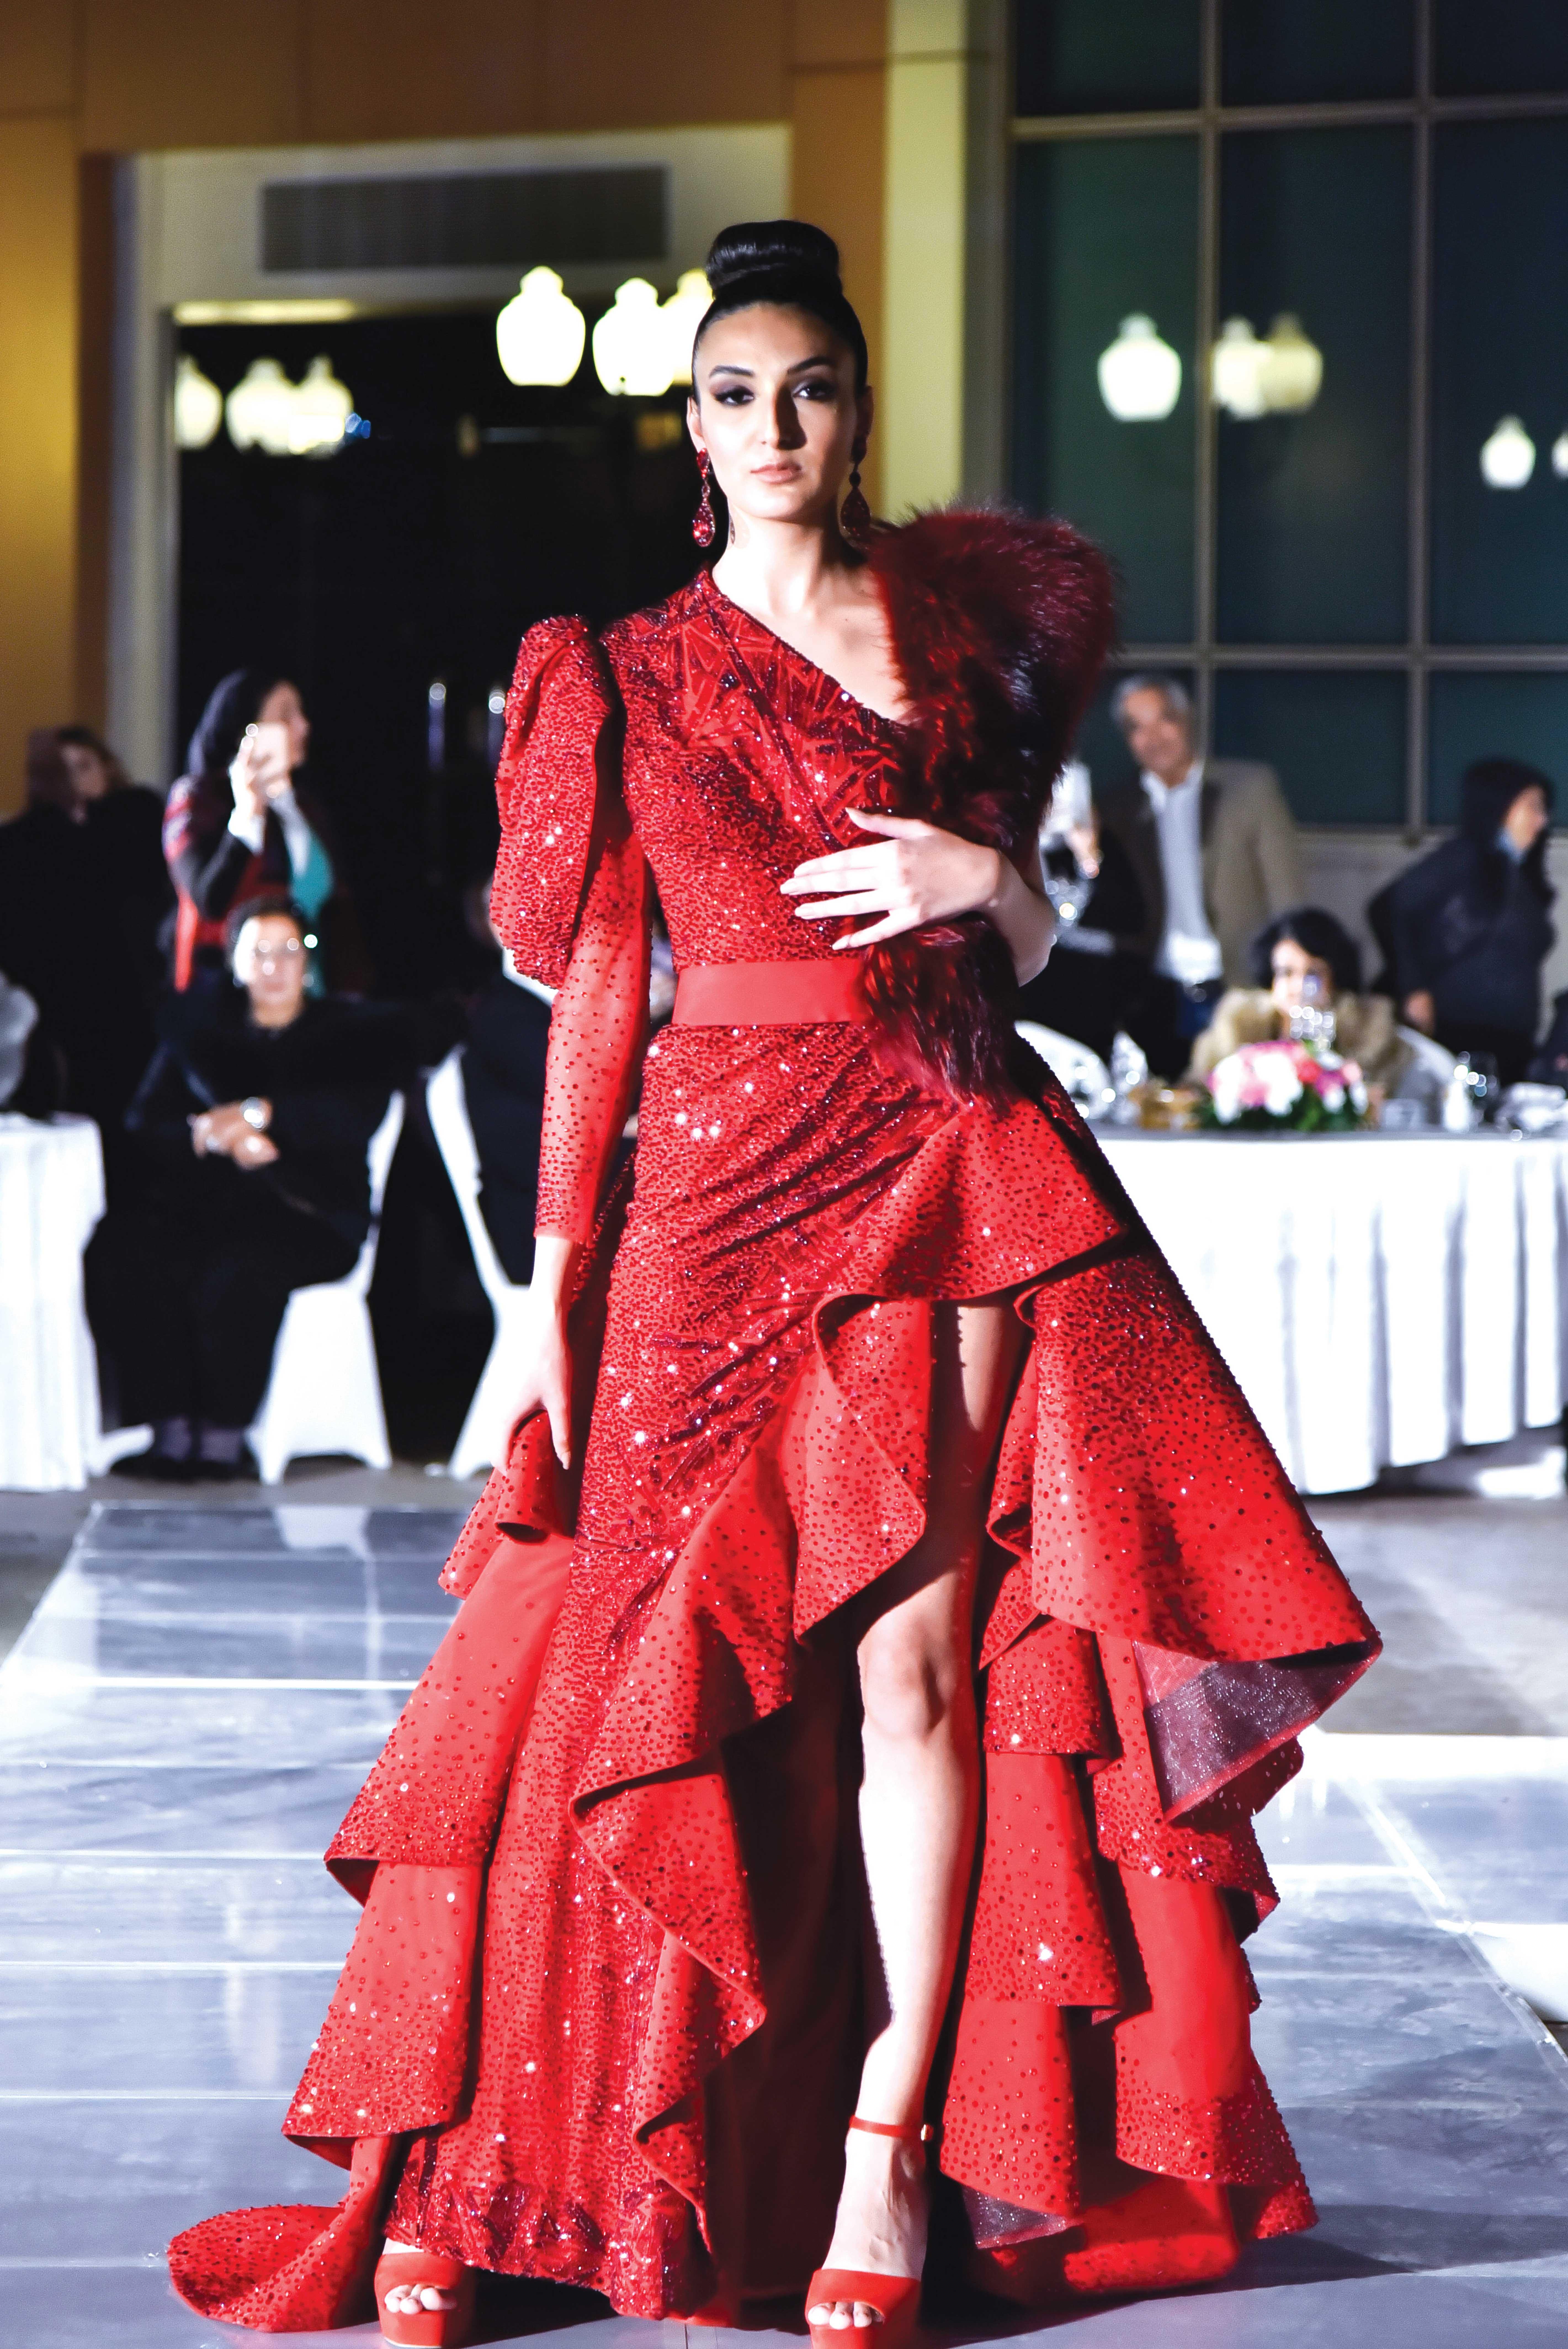 Dress by Hany Elbeheiry